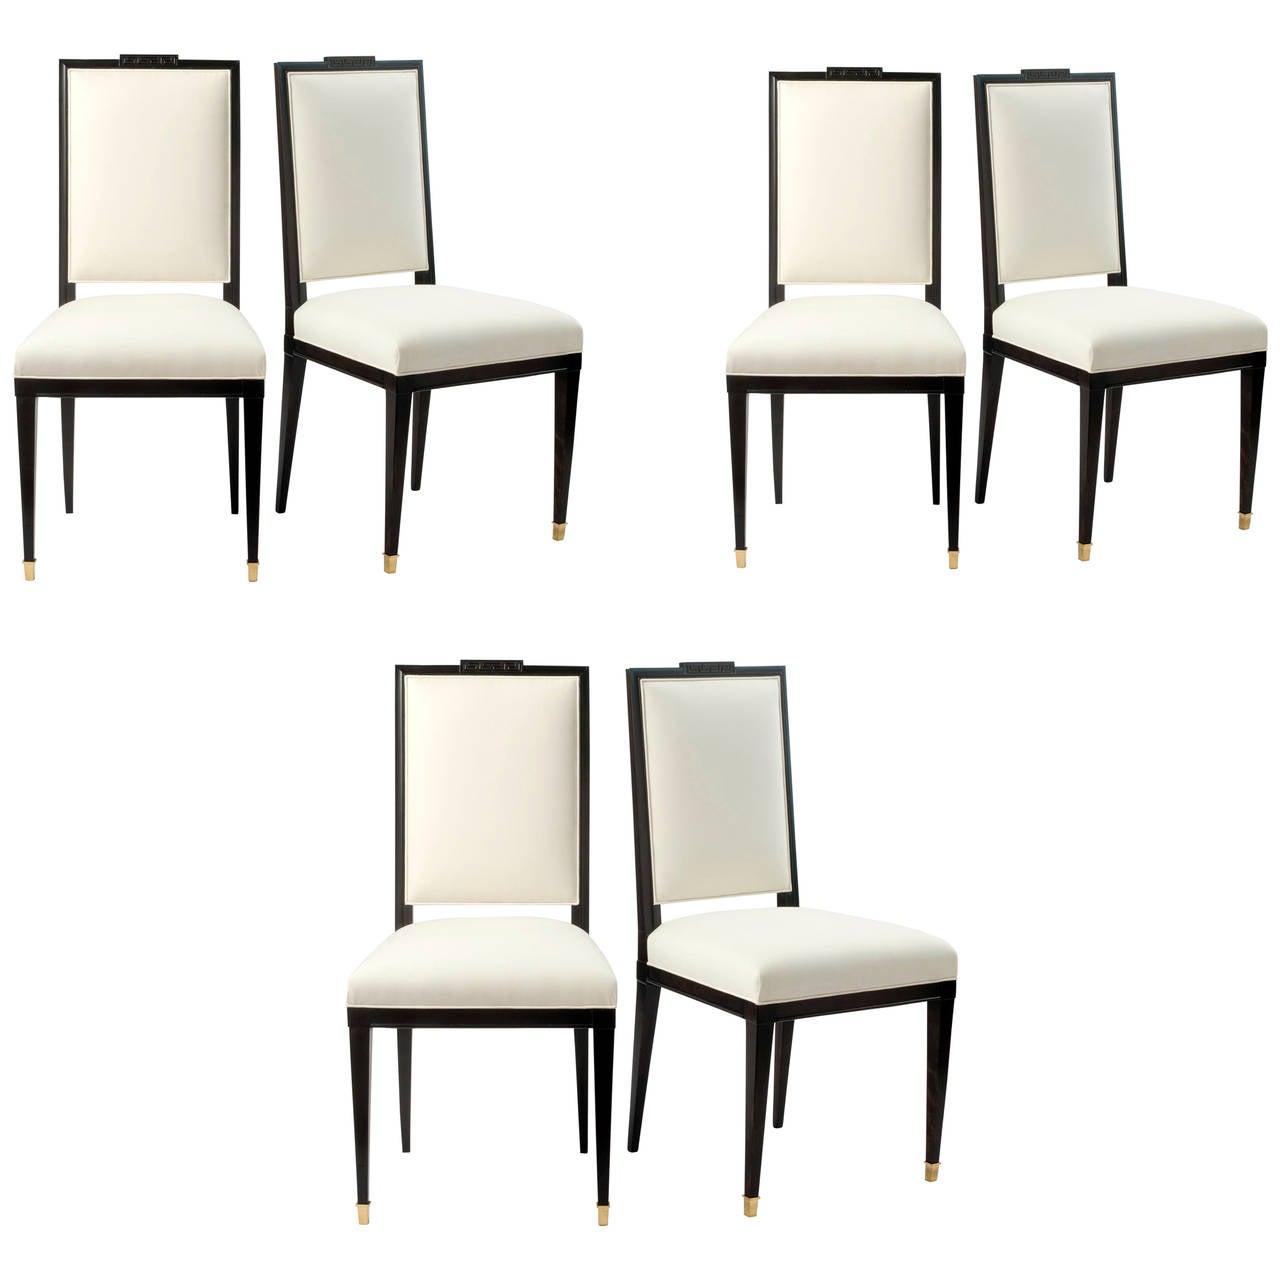 Fascinating dining room furniture houston tx inspired pics for Dining room tables houston tx